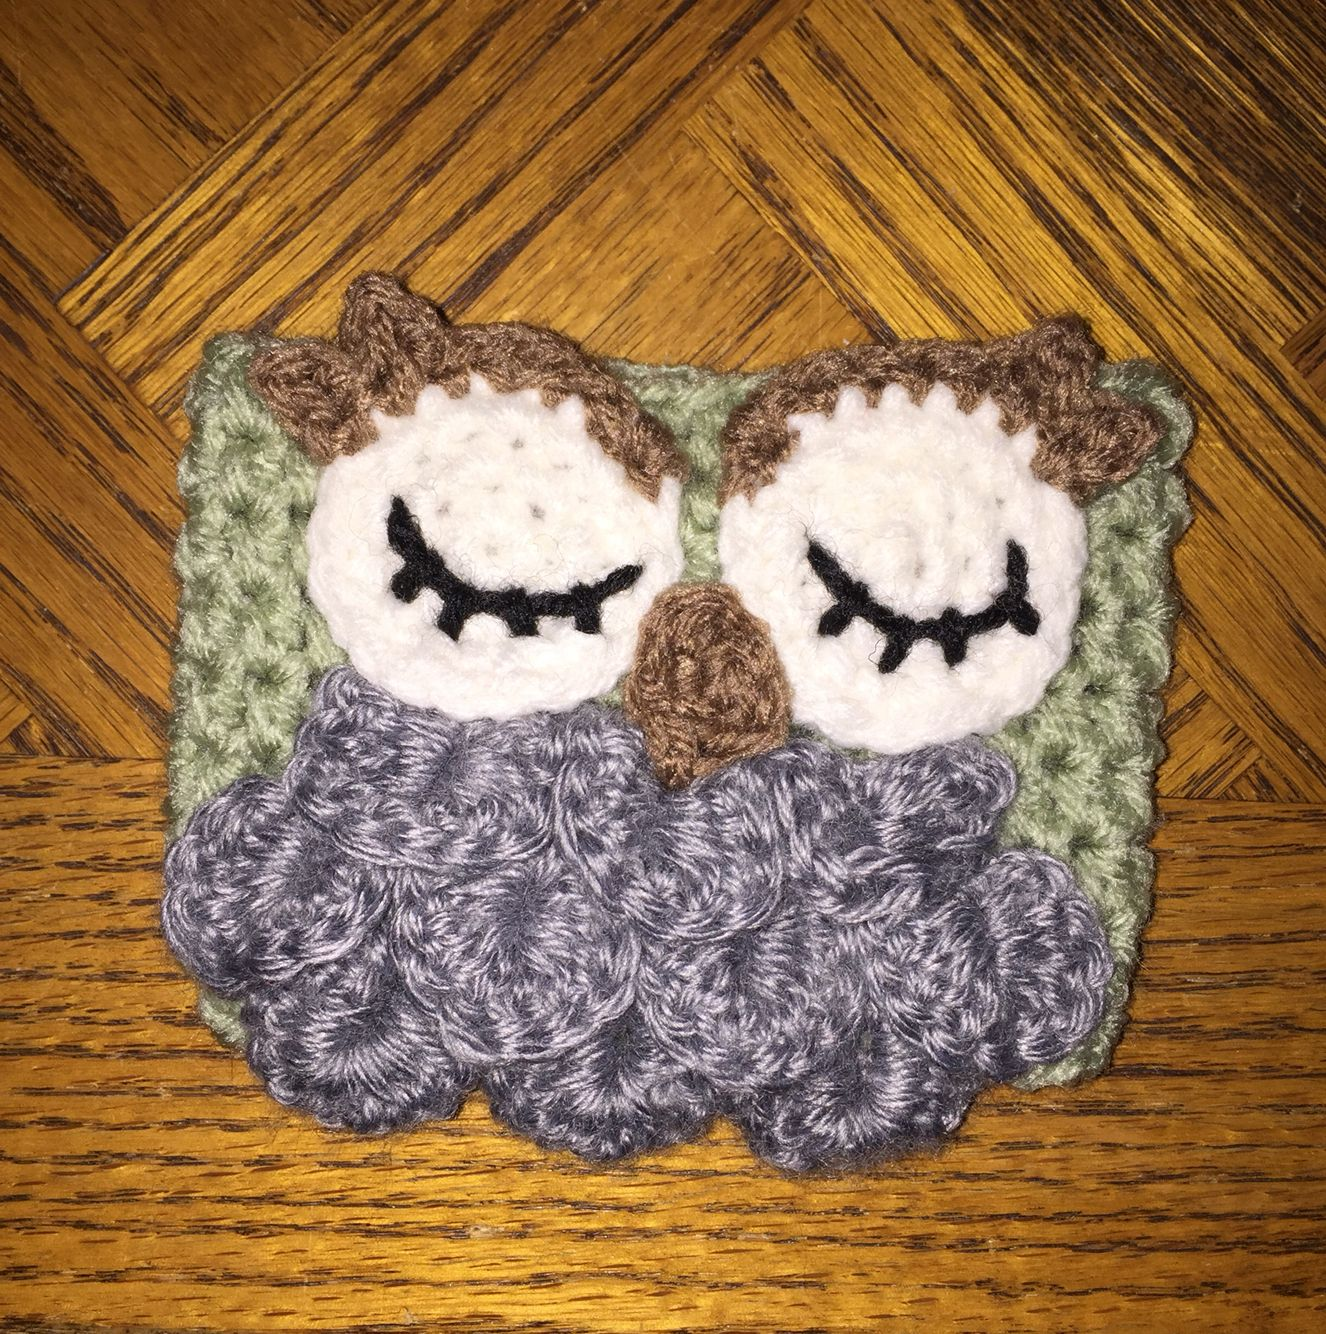 Crochet Owl Cozie. Check out LDJ Crochet on Facebook and Instagram. #ldjcrochet